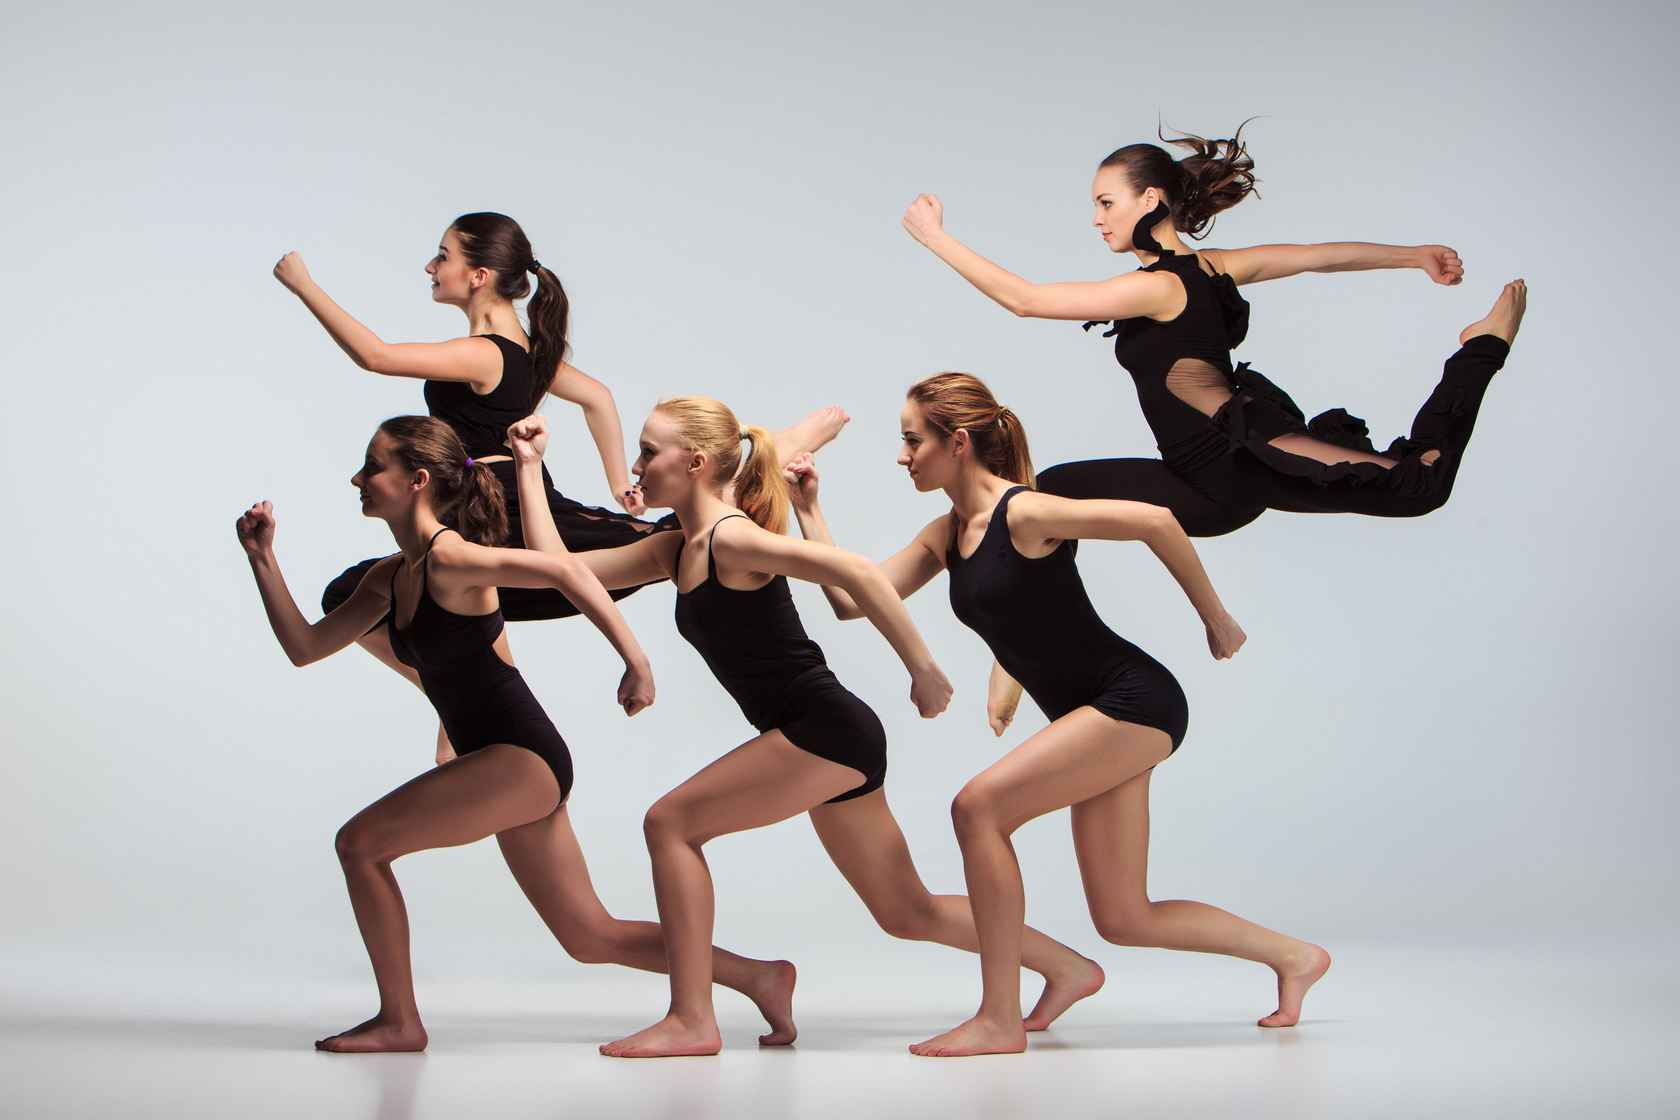 the-group-of-modern-ballet-dancers-PYB92XN.jpg